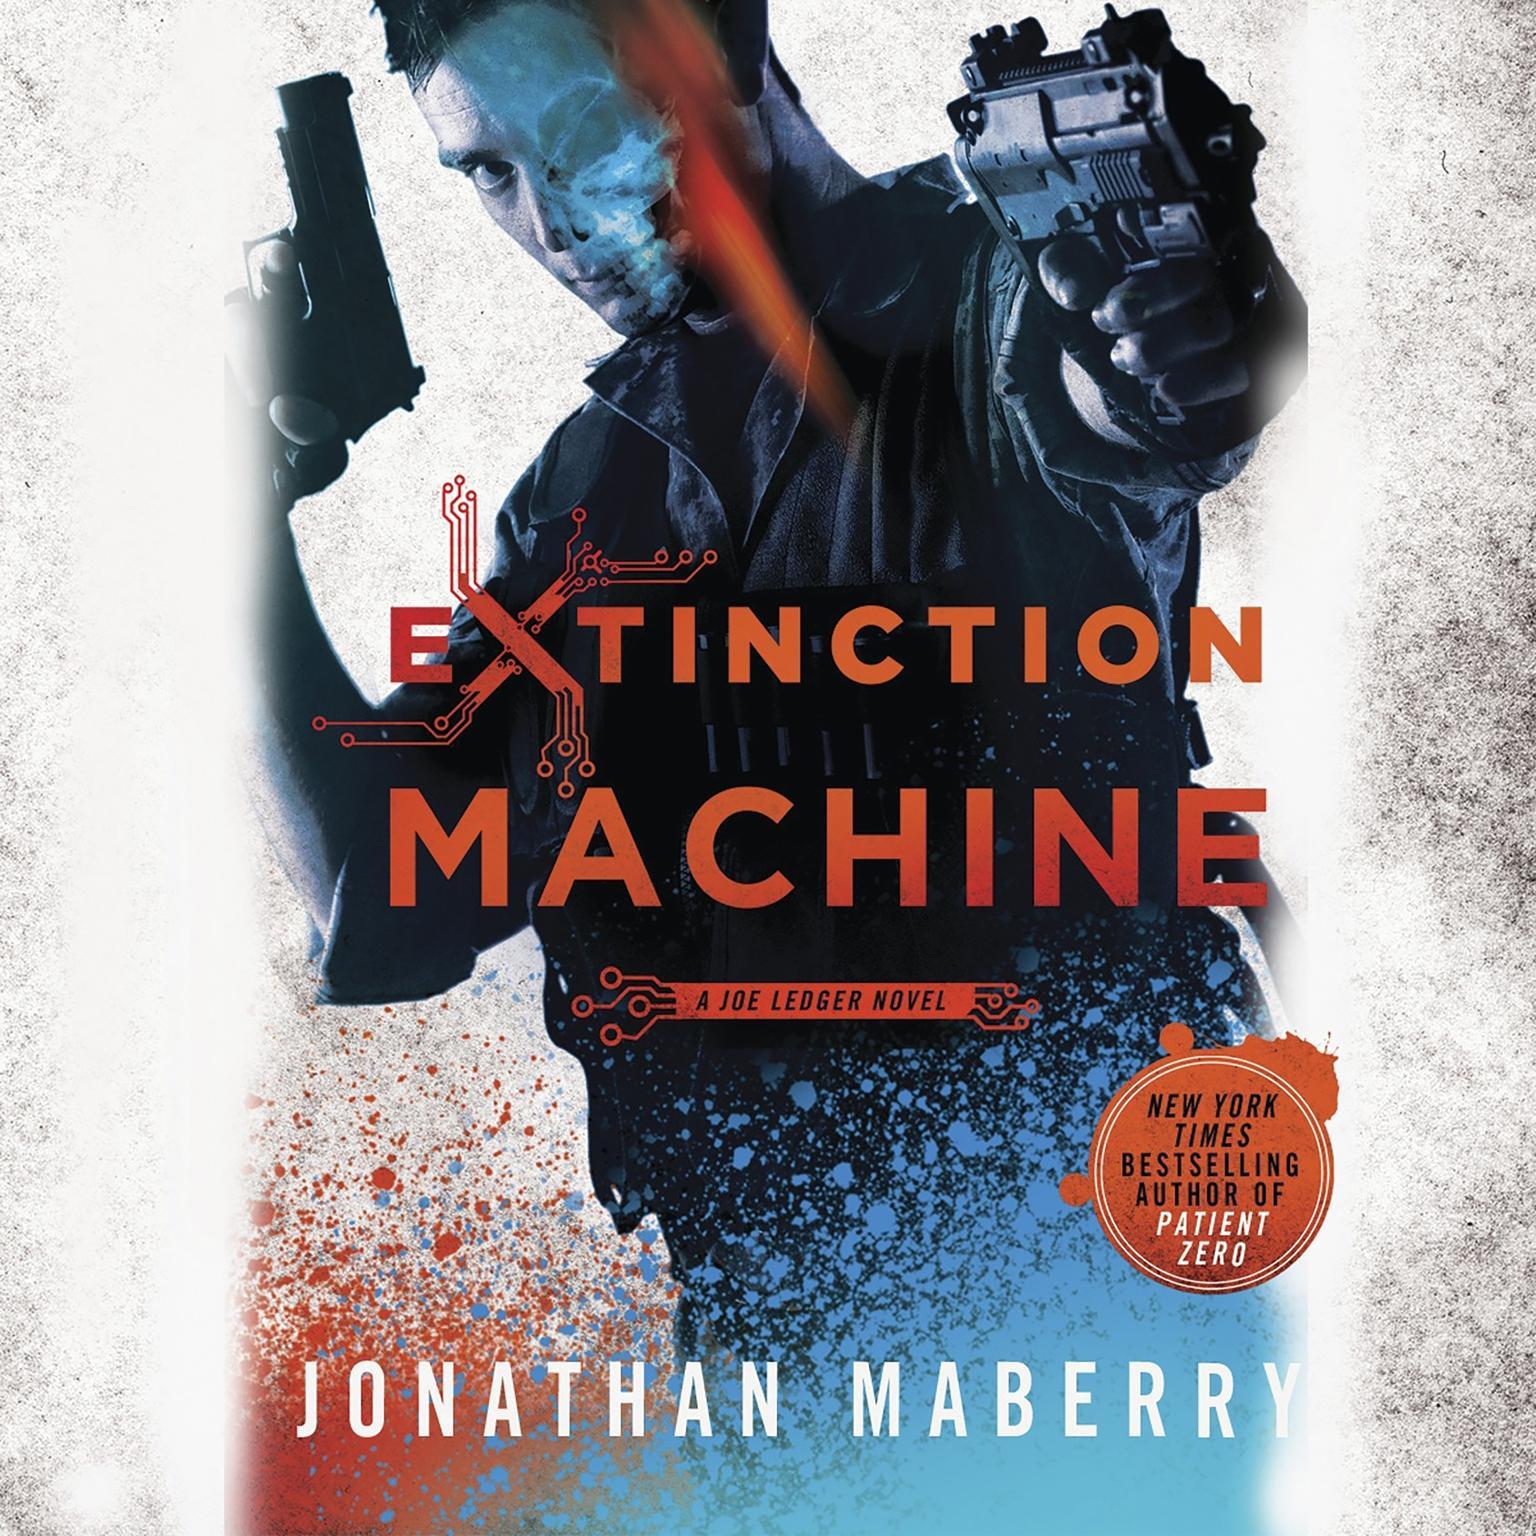 Extinction Machine_Jonathan Maberry.jpg